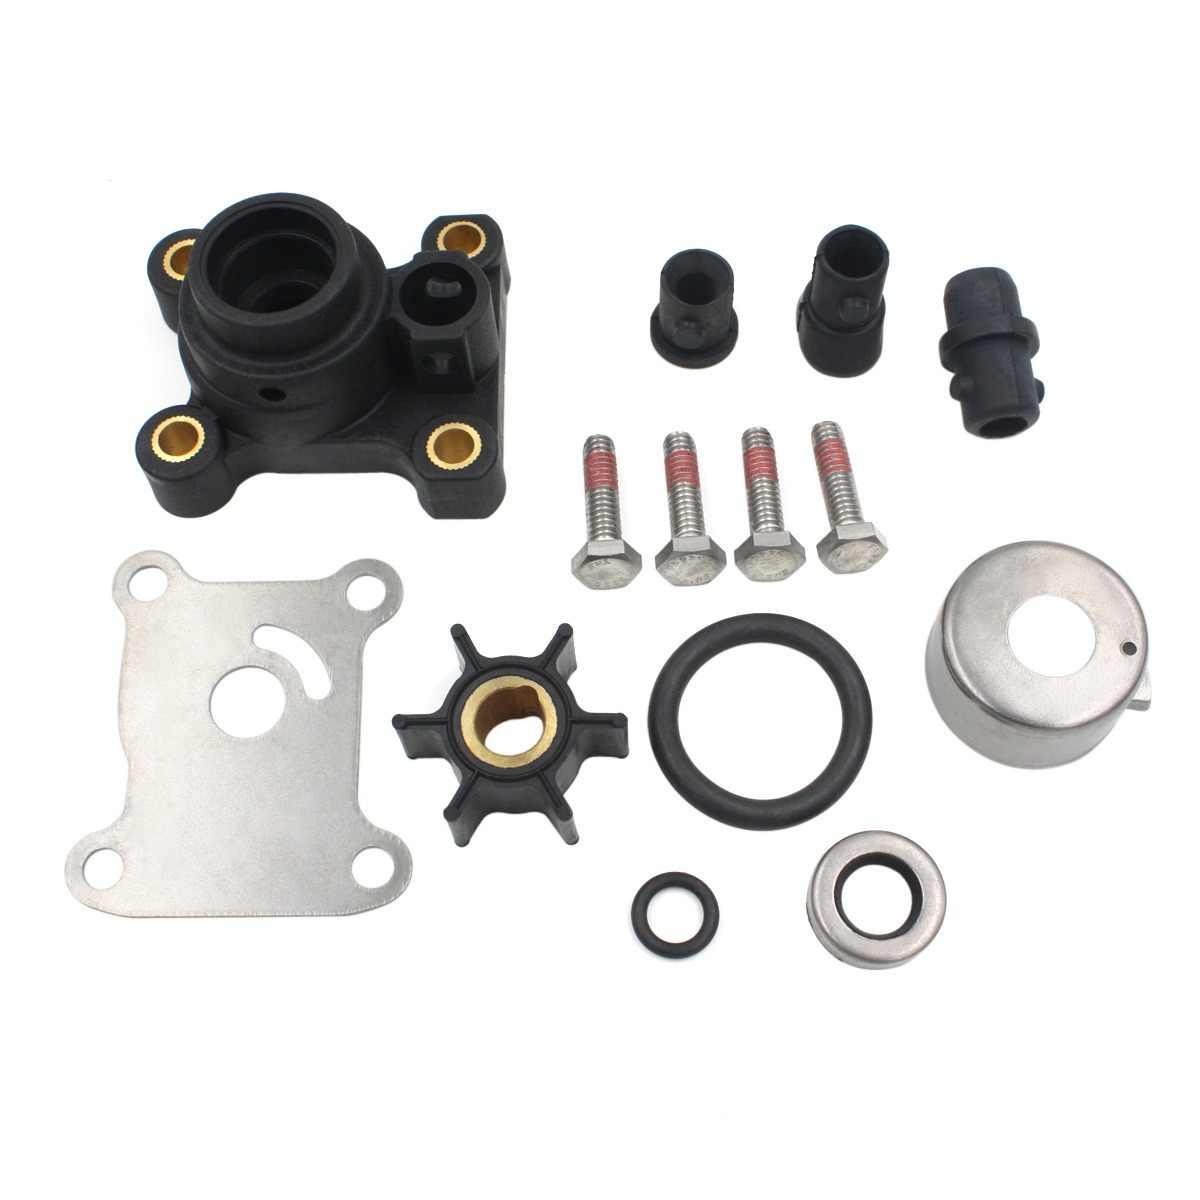 small resolution of 9 9hp 15hp impeller water pump repair kit for johnson evinrude 394711 0394711 391698